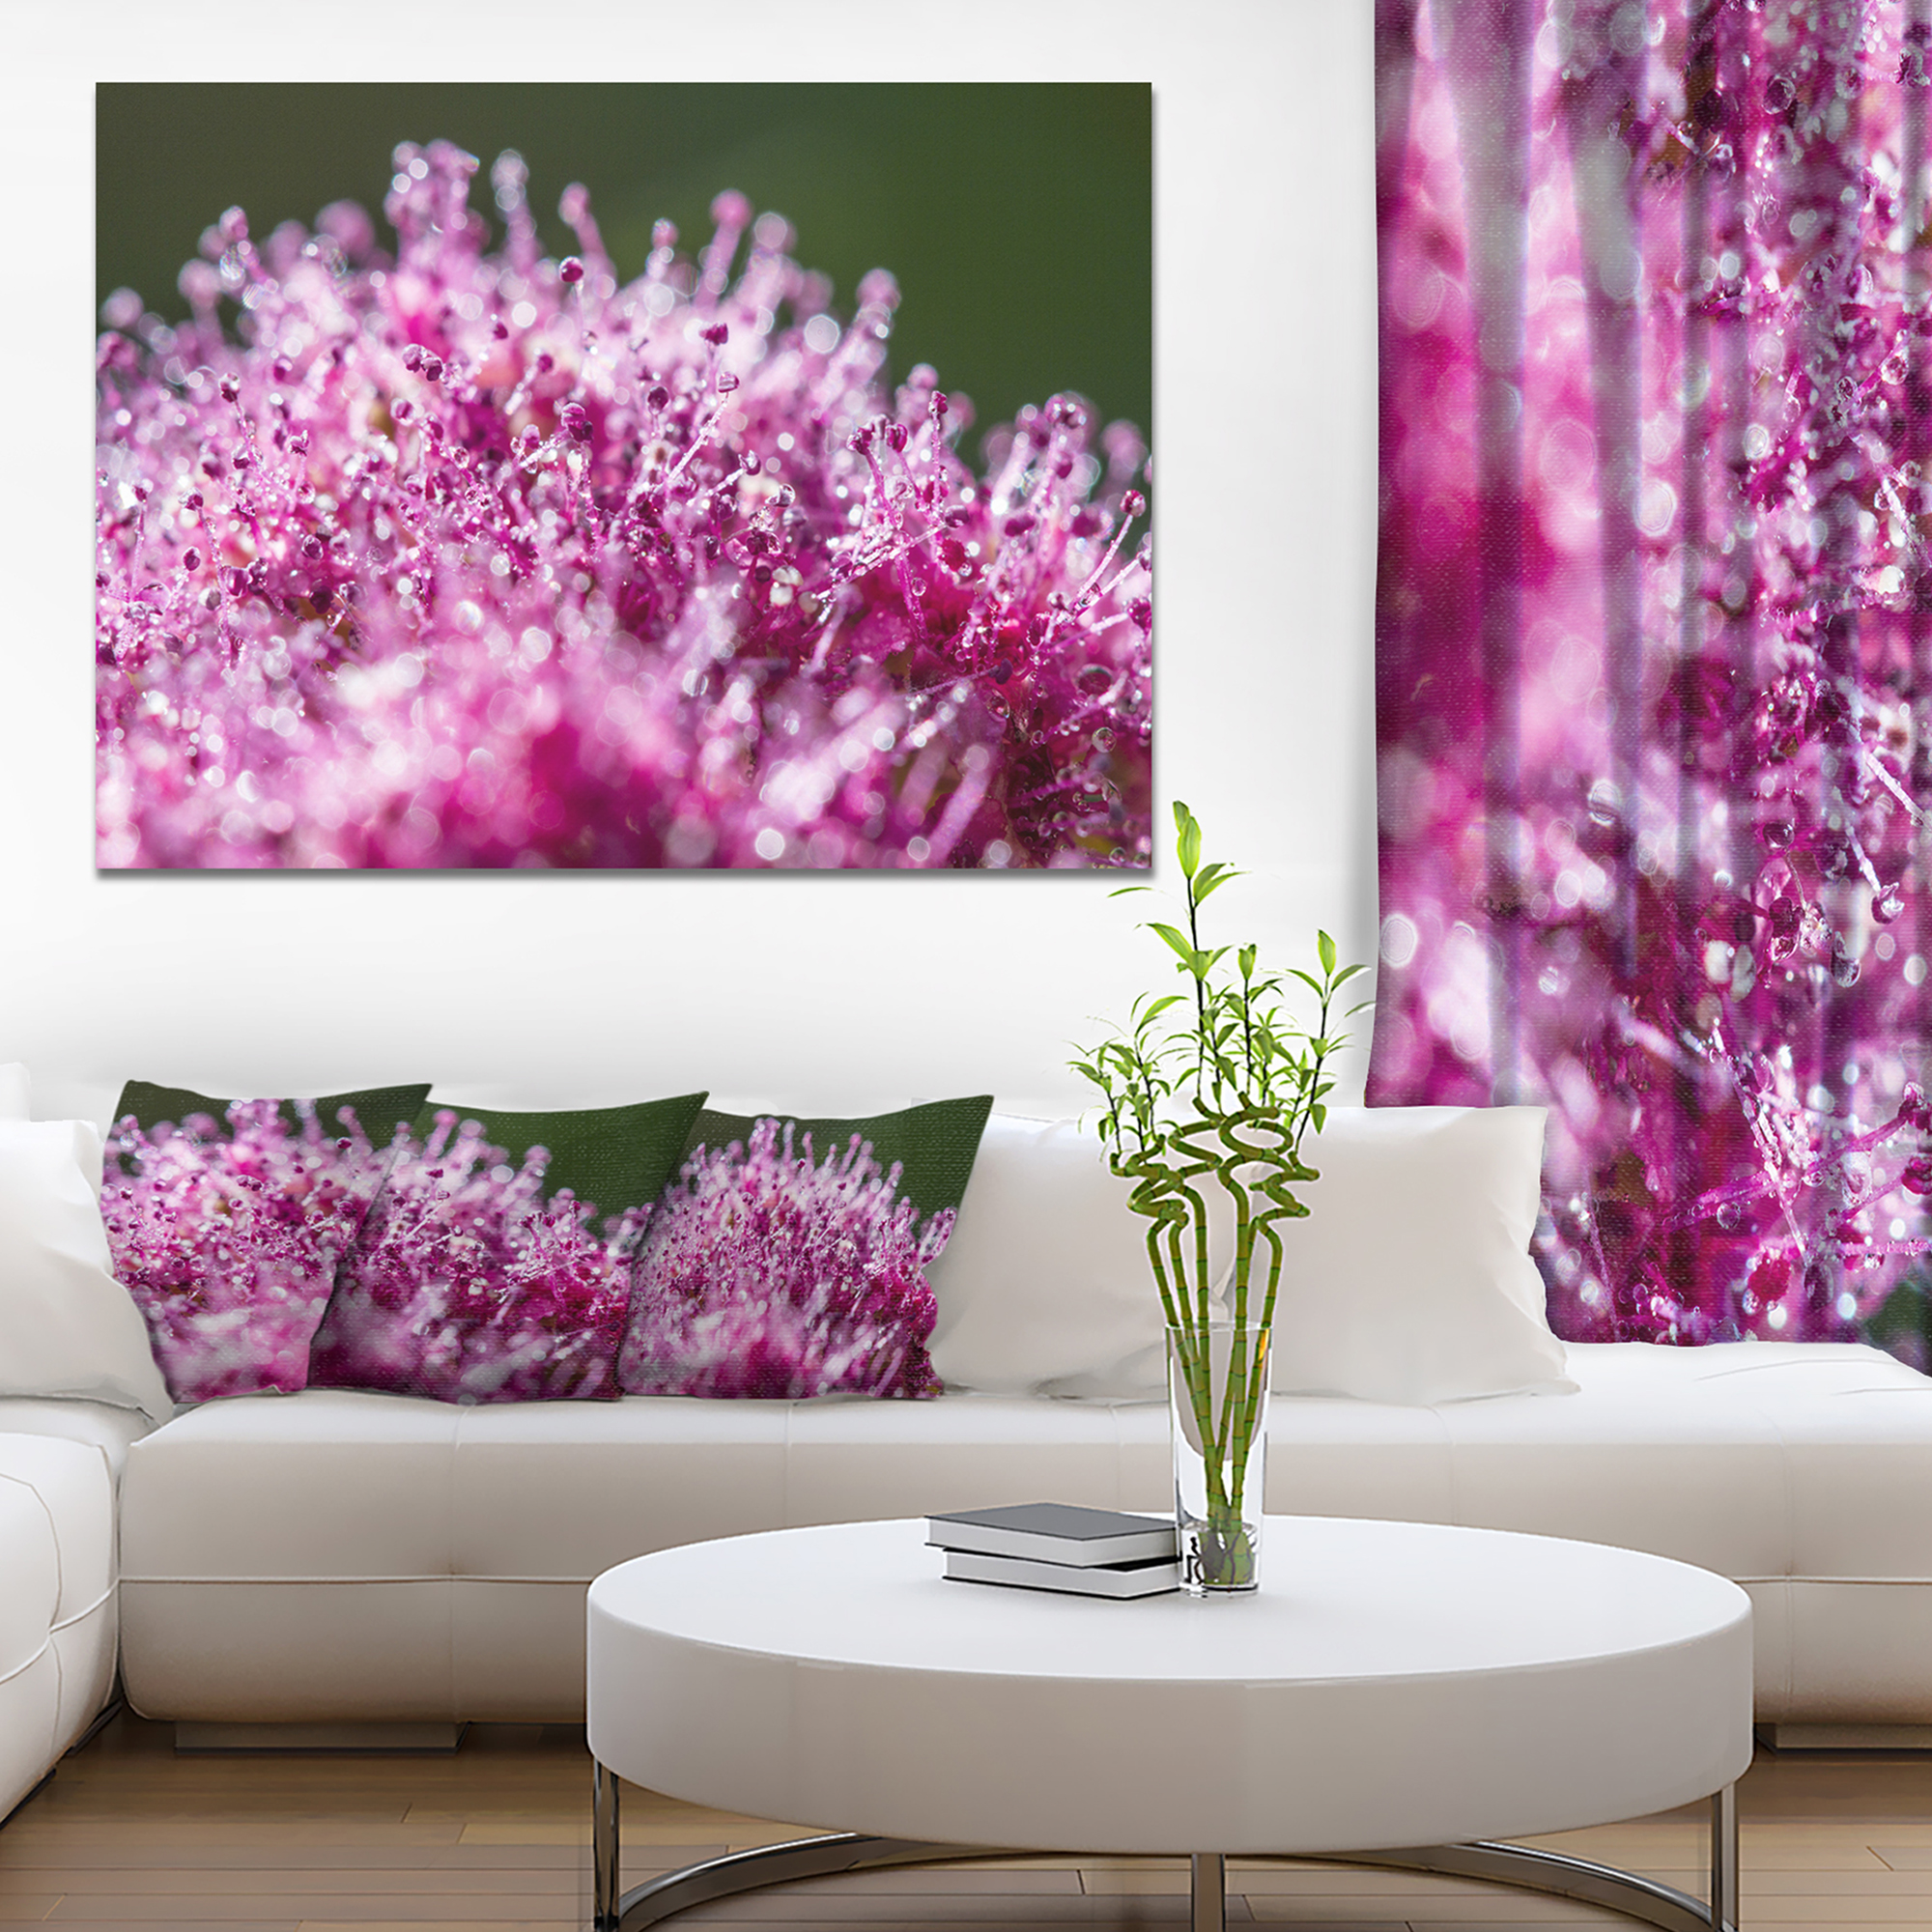 Pink Little Flowers Close up View - Large Floral Wall Art Canvas - image 3 de 3